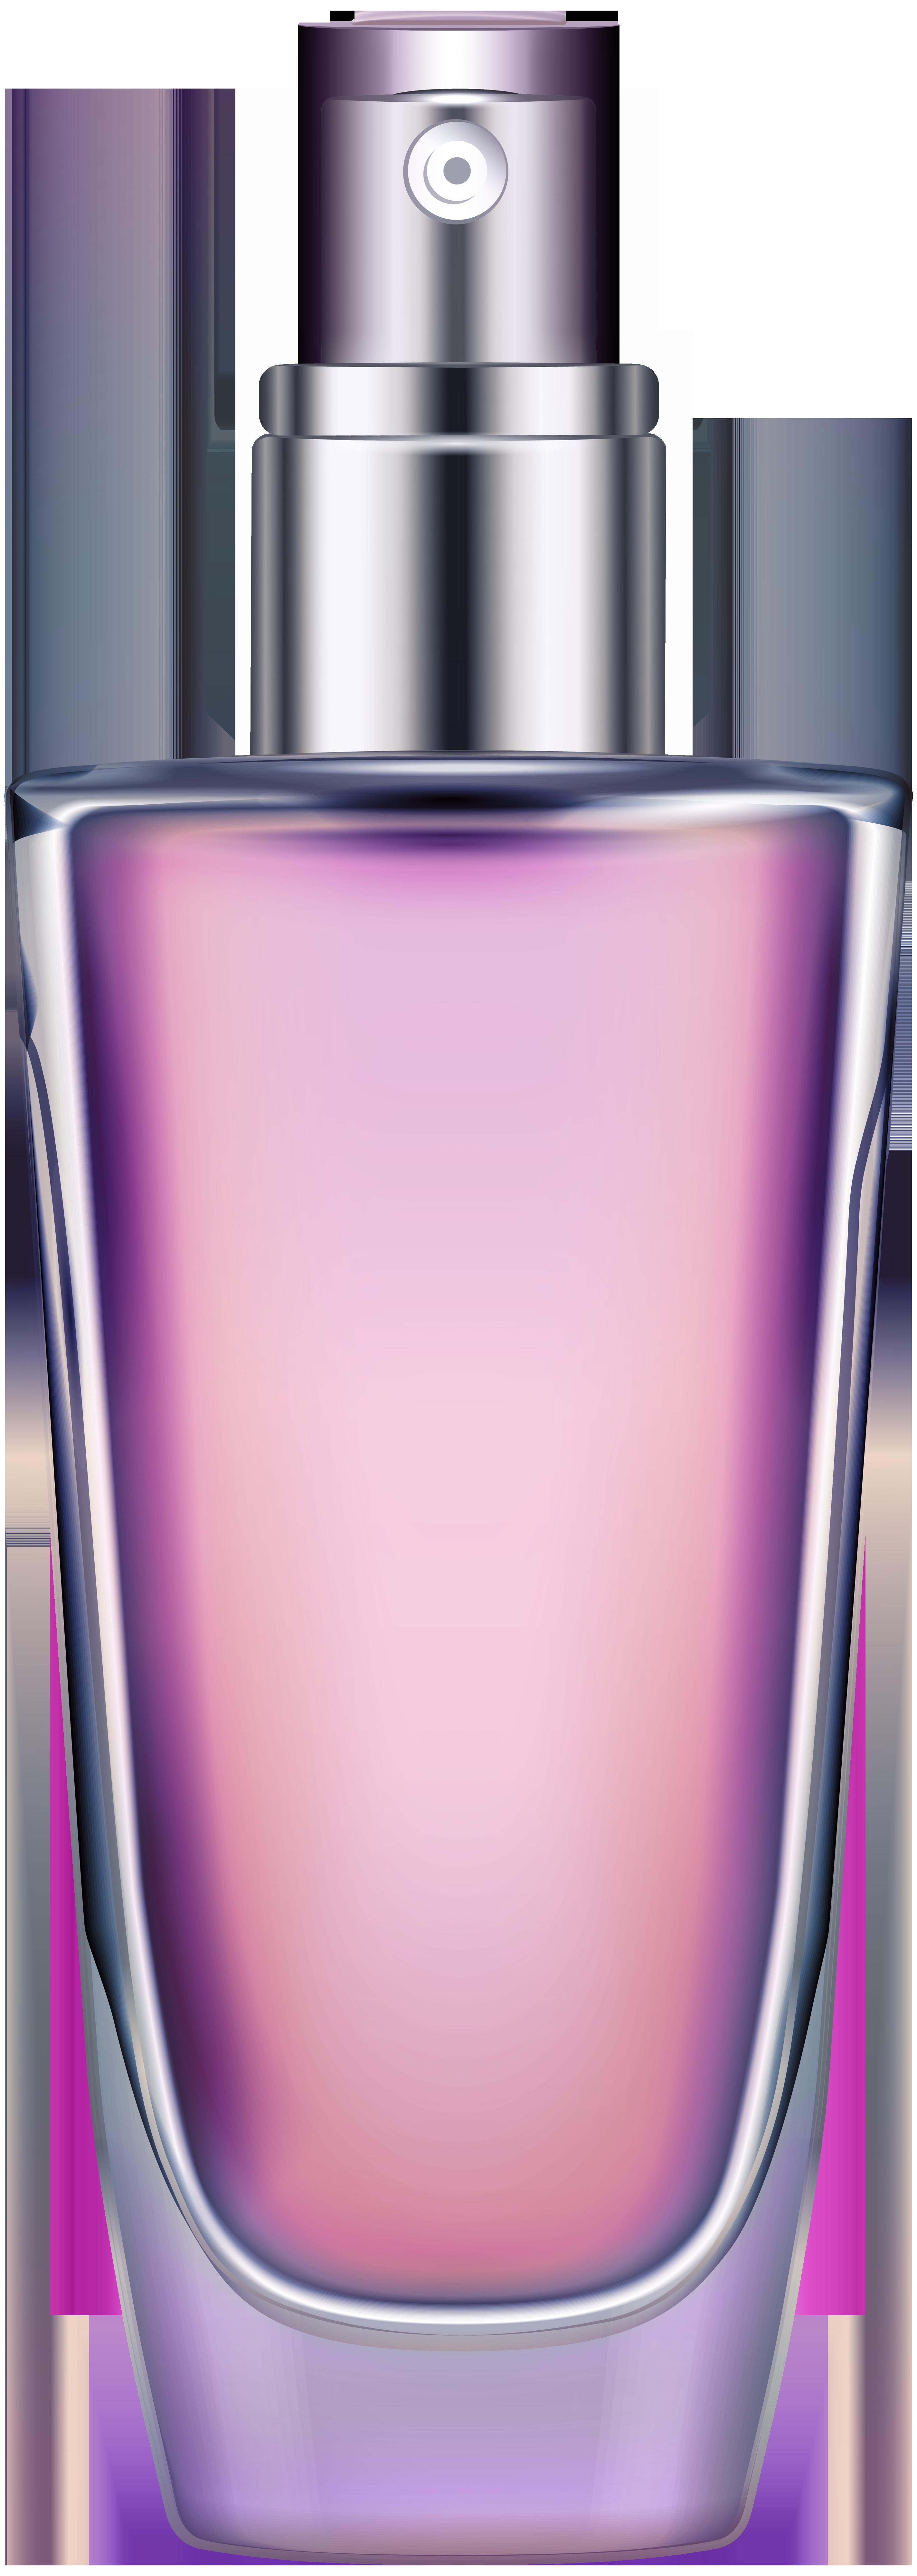 Perfume clipart pink perfume. Transparent clip art image